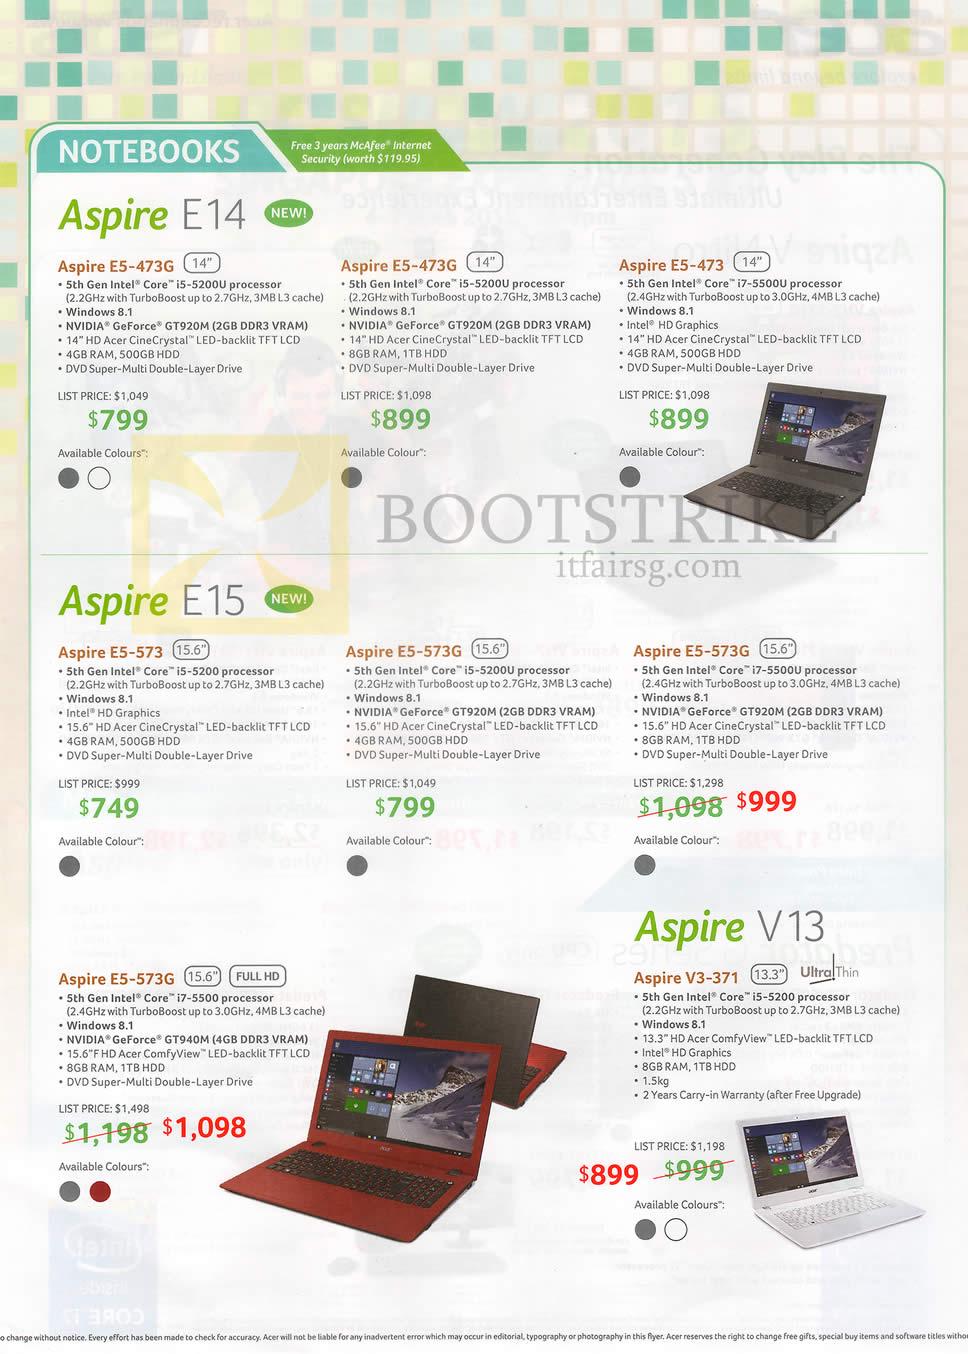 PC SHOW 2015 price list image brochure of Acer Notebooks Aspire E5-473, 473G, 573, 573G, V3-371